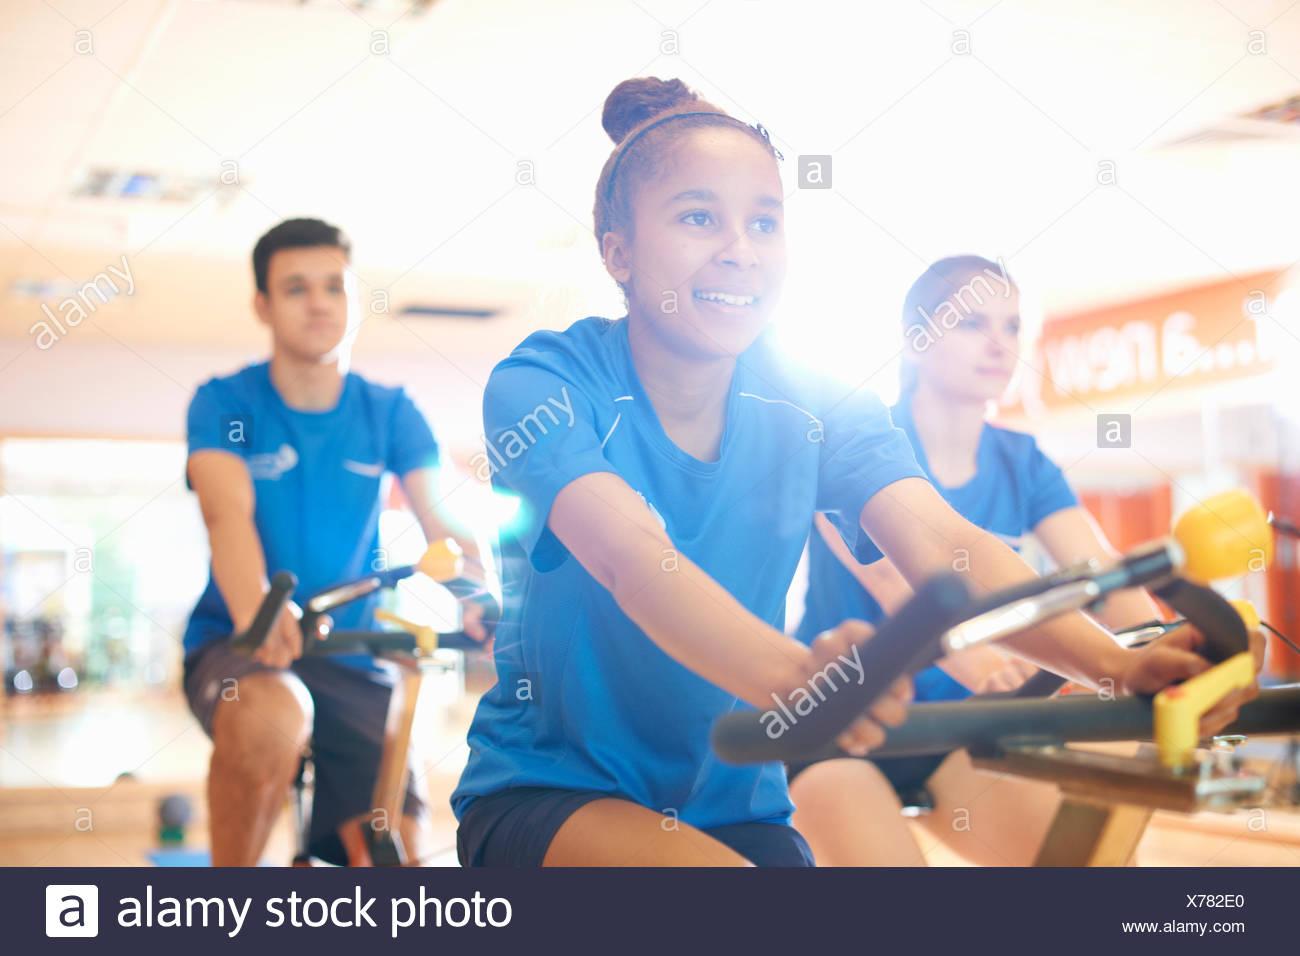 Young woman on exercise bike - Stock Image